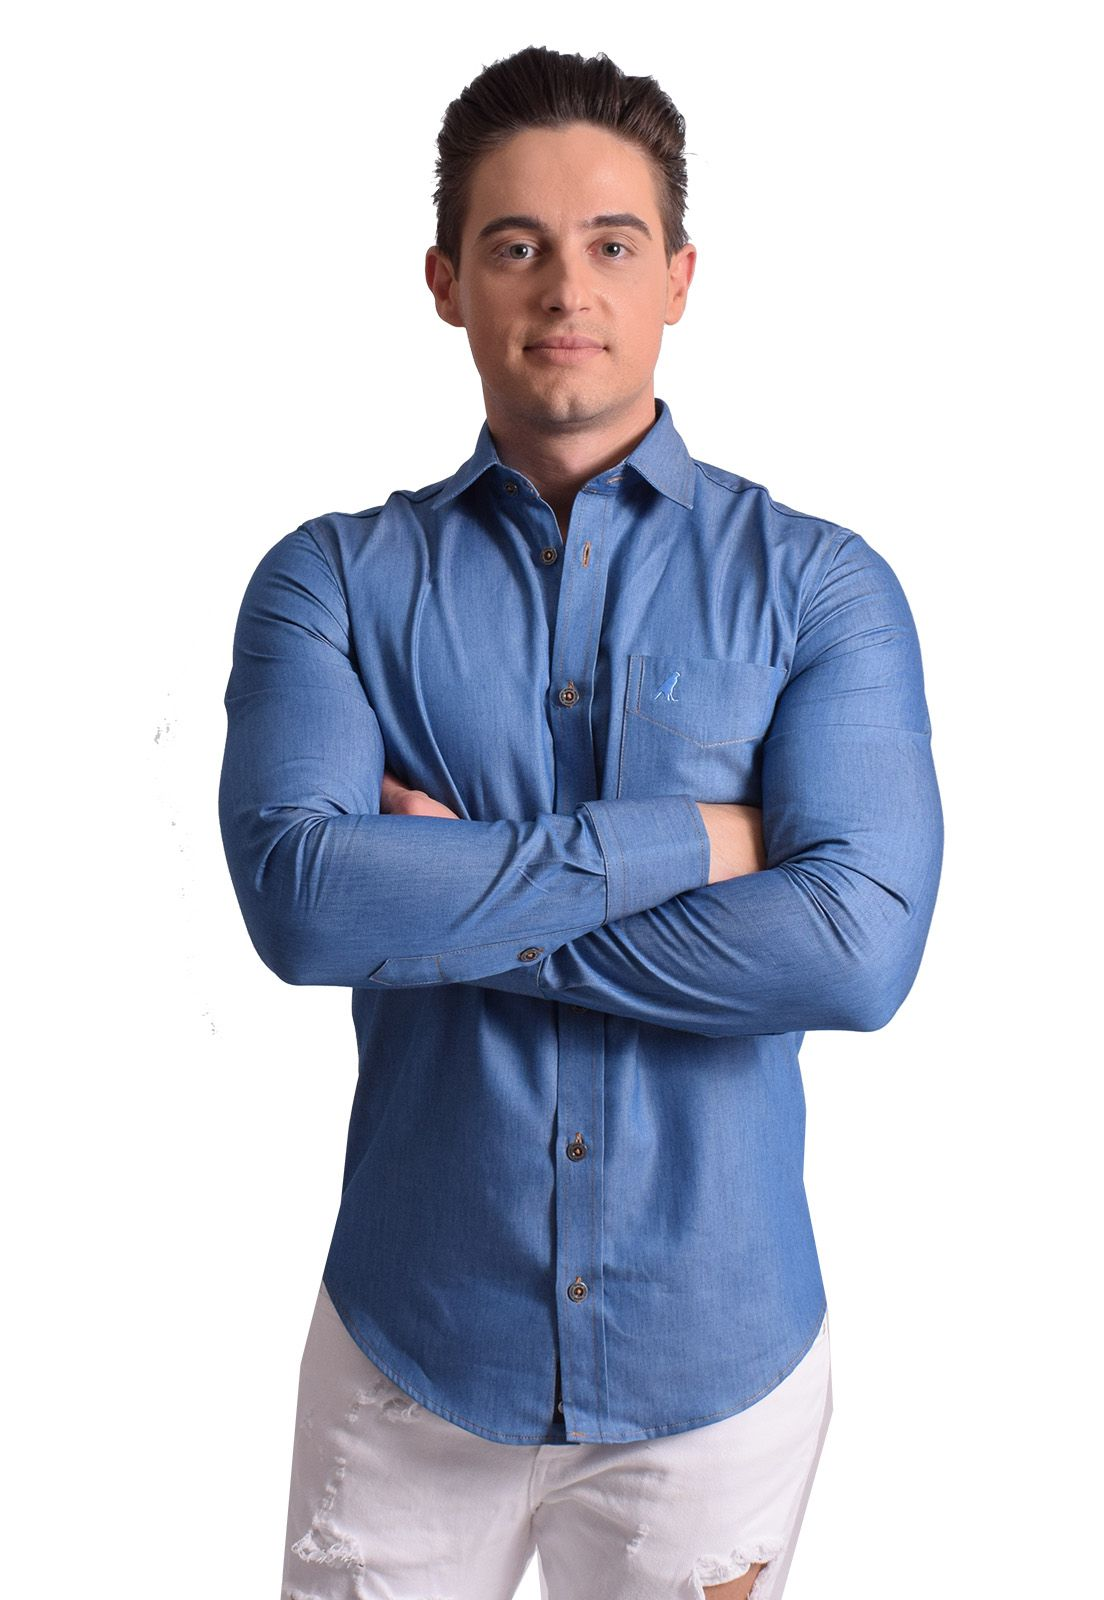 100301 - Camisa Social Jeans Masculina Slim - LEVOK